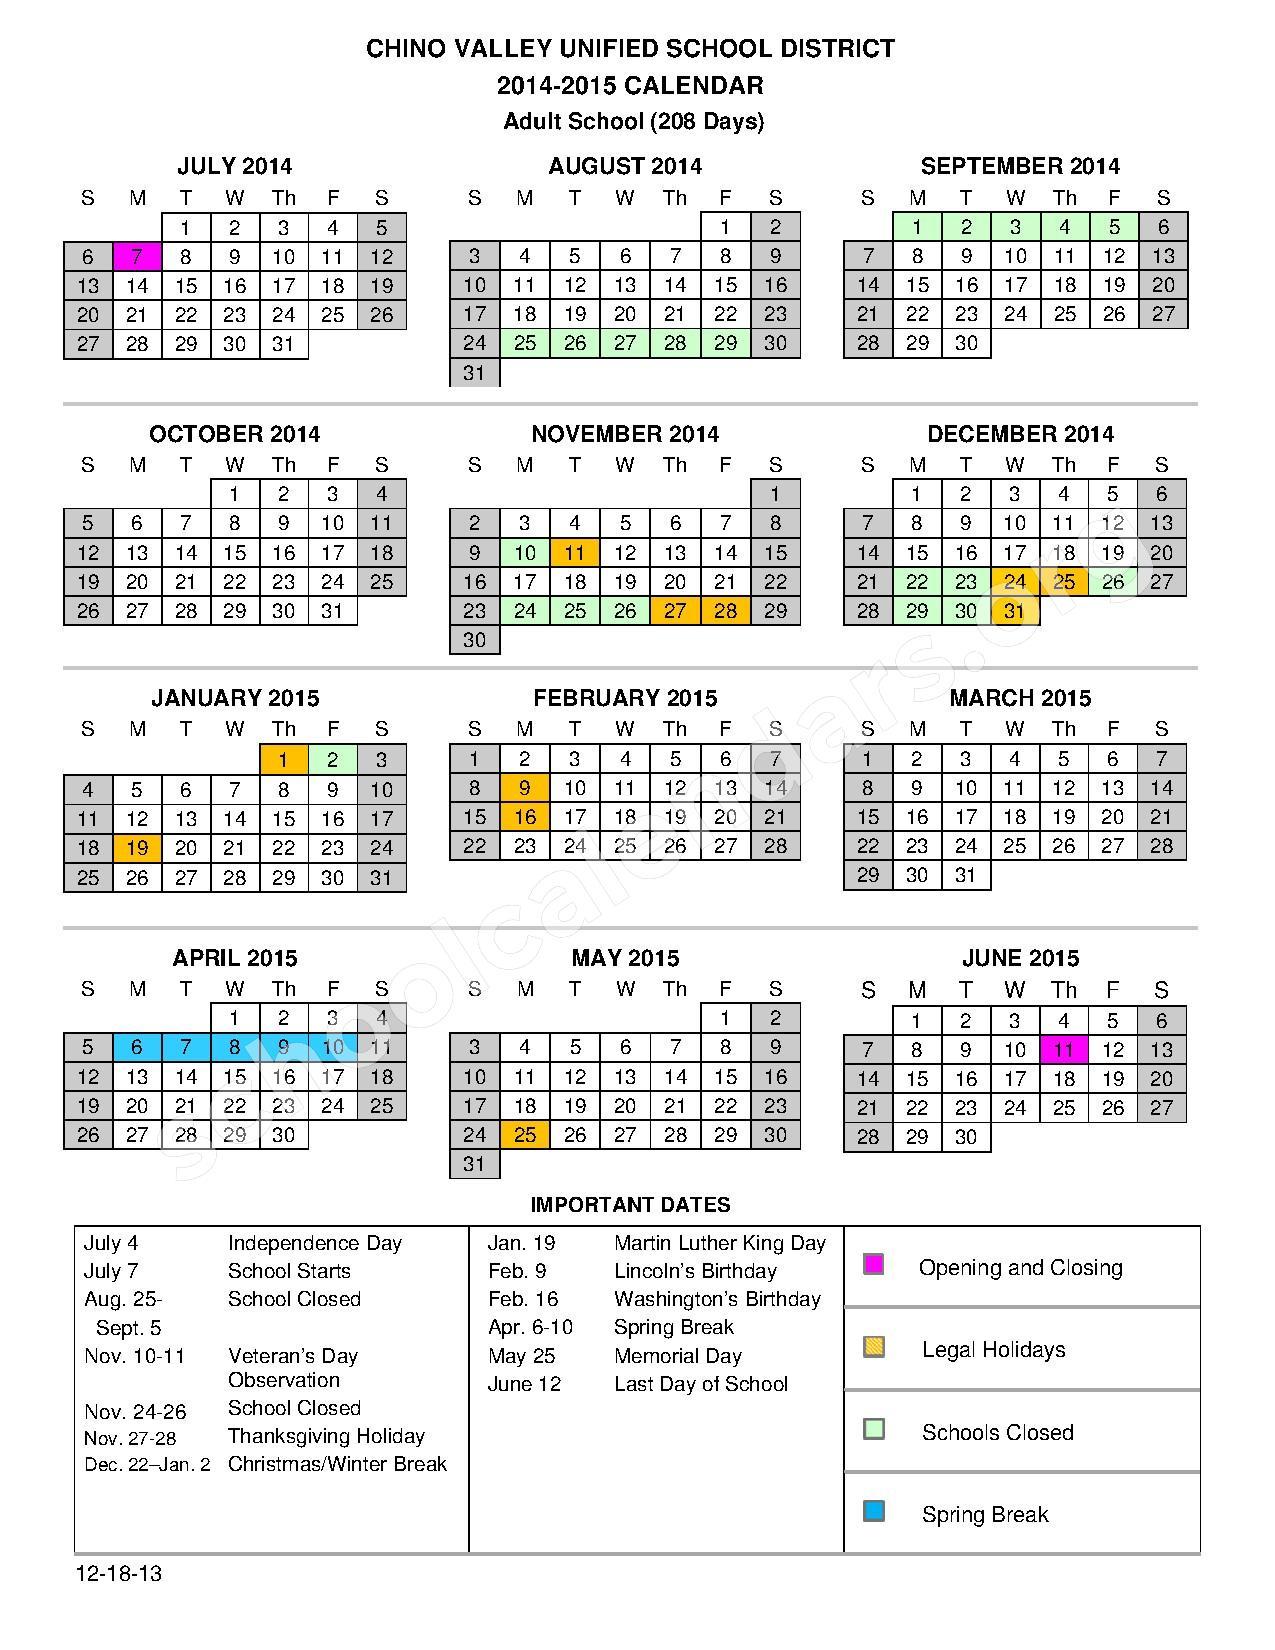 Aiken High School Sc Calendar For 2015 | Printable pertaining to Aiken County School Calendar